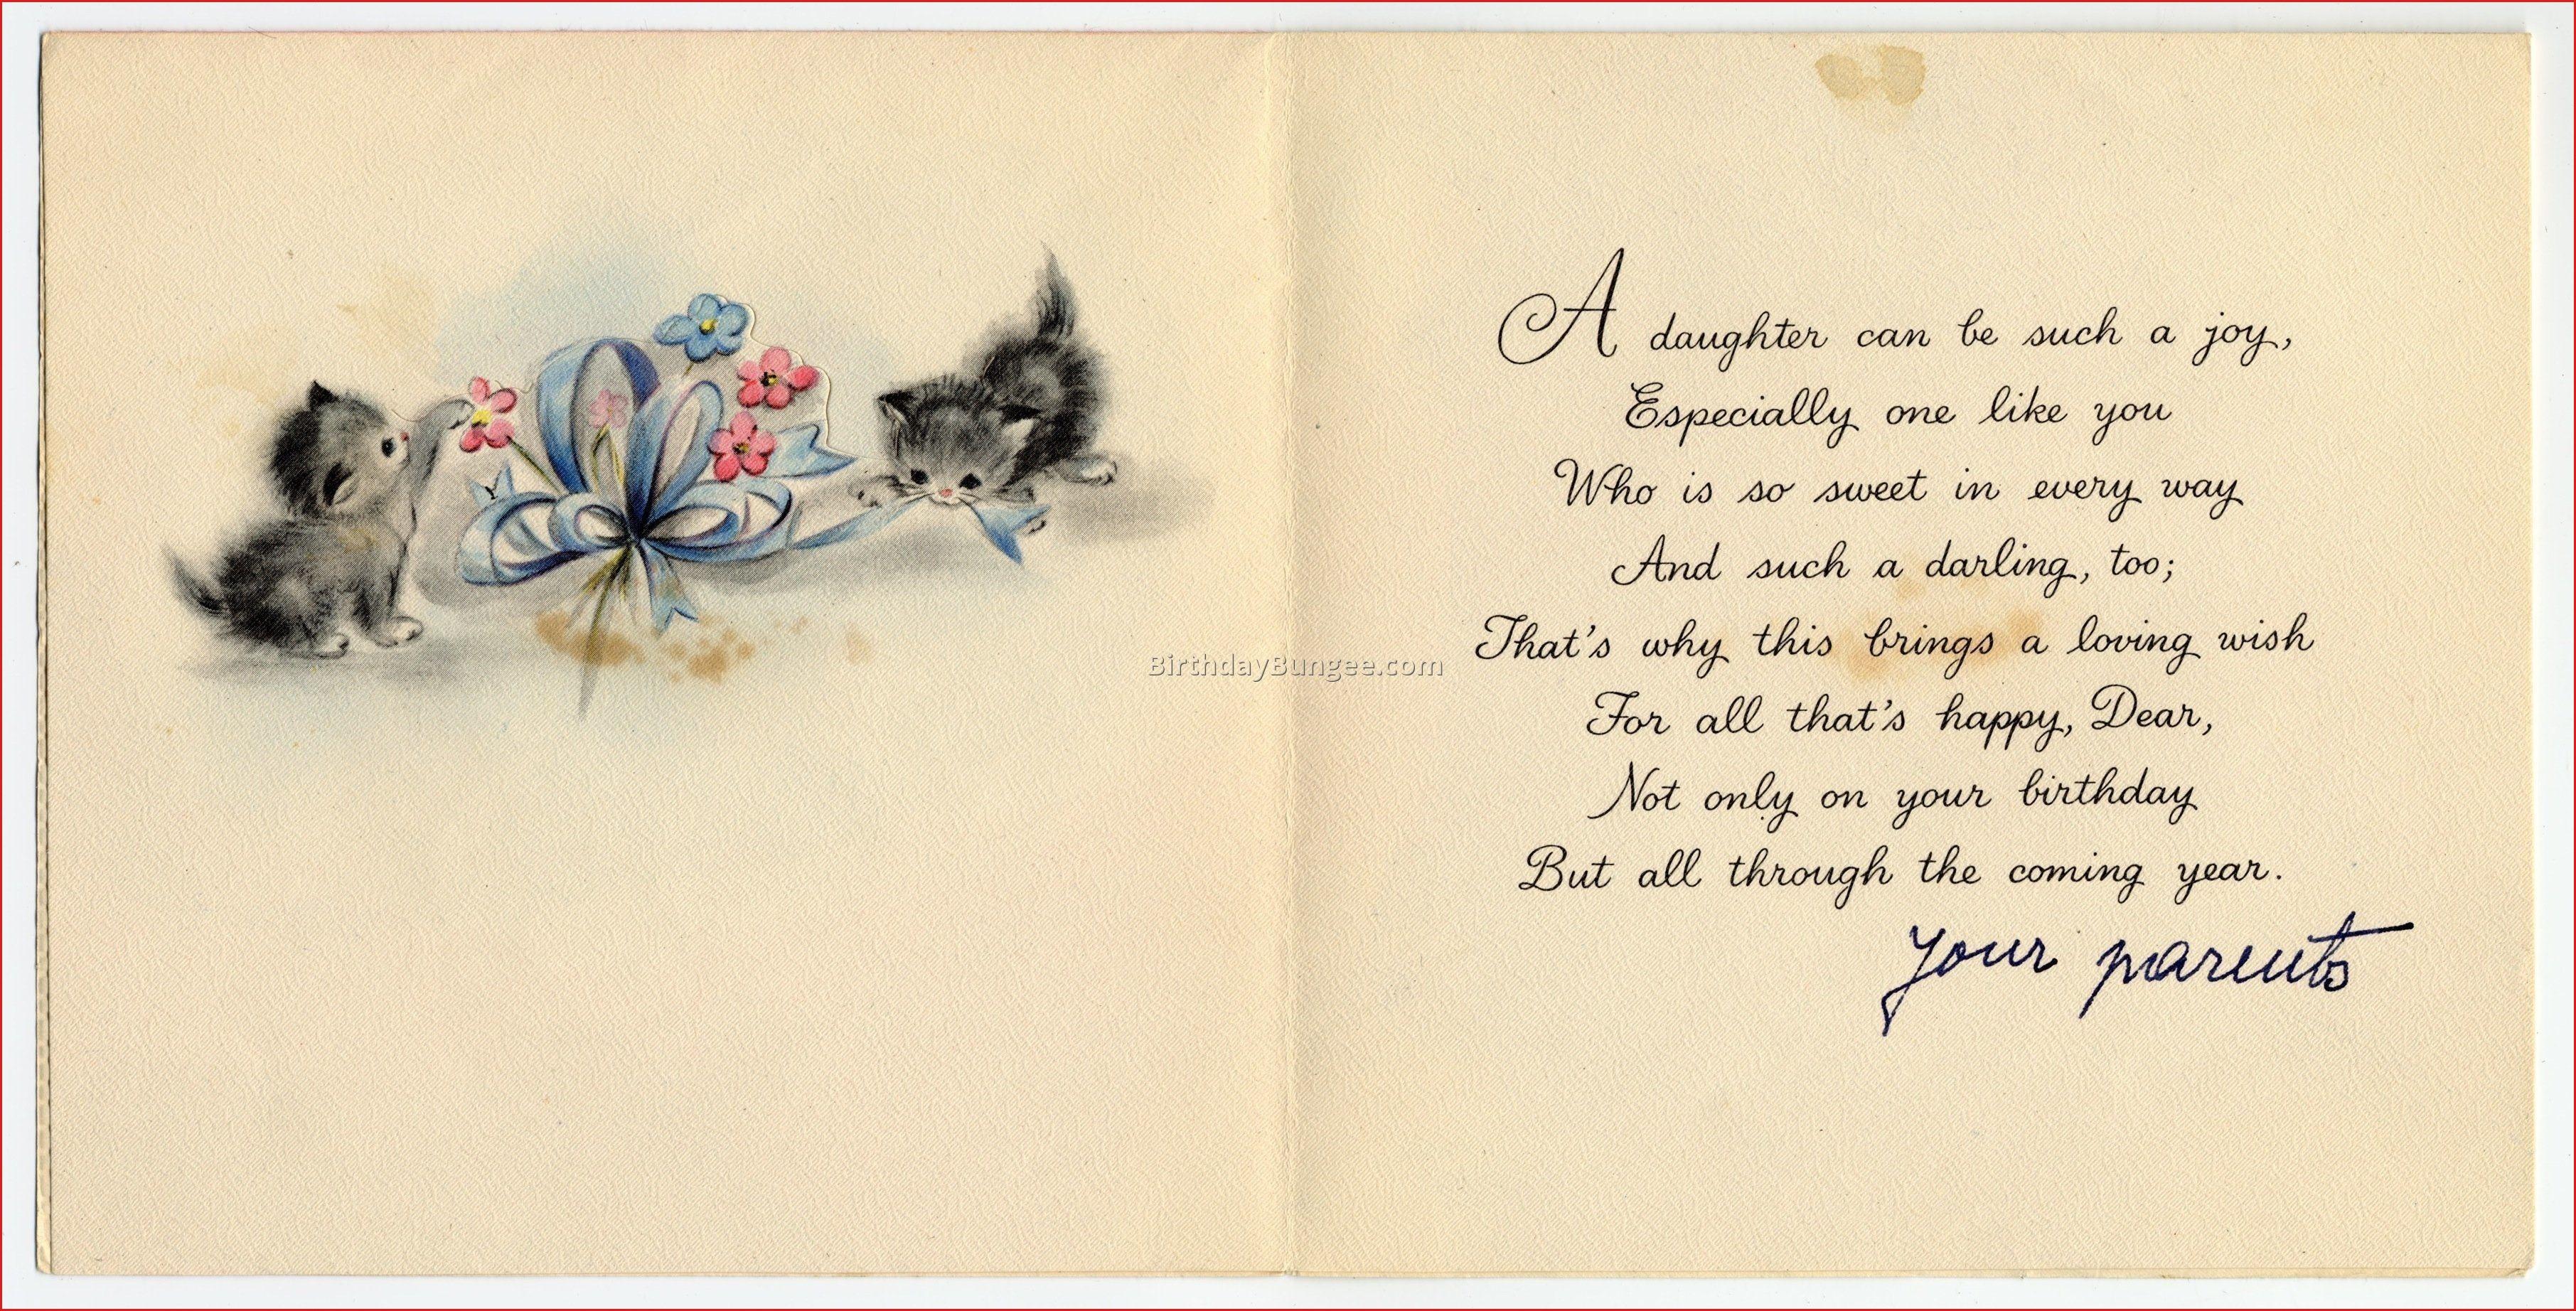 16 Best Hallmark Birthday Cards For Daughter : Lenq - Free Printable Hallmark Birthday Cards